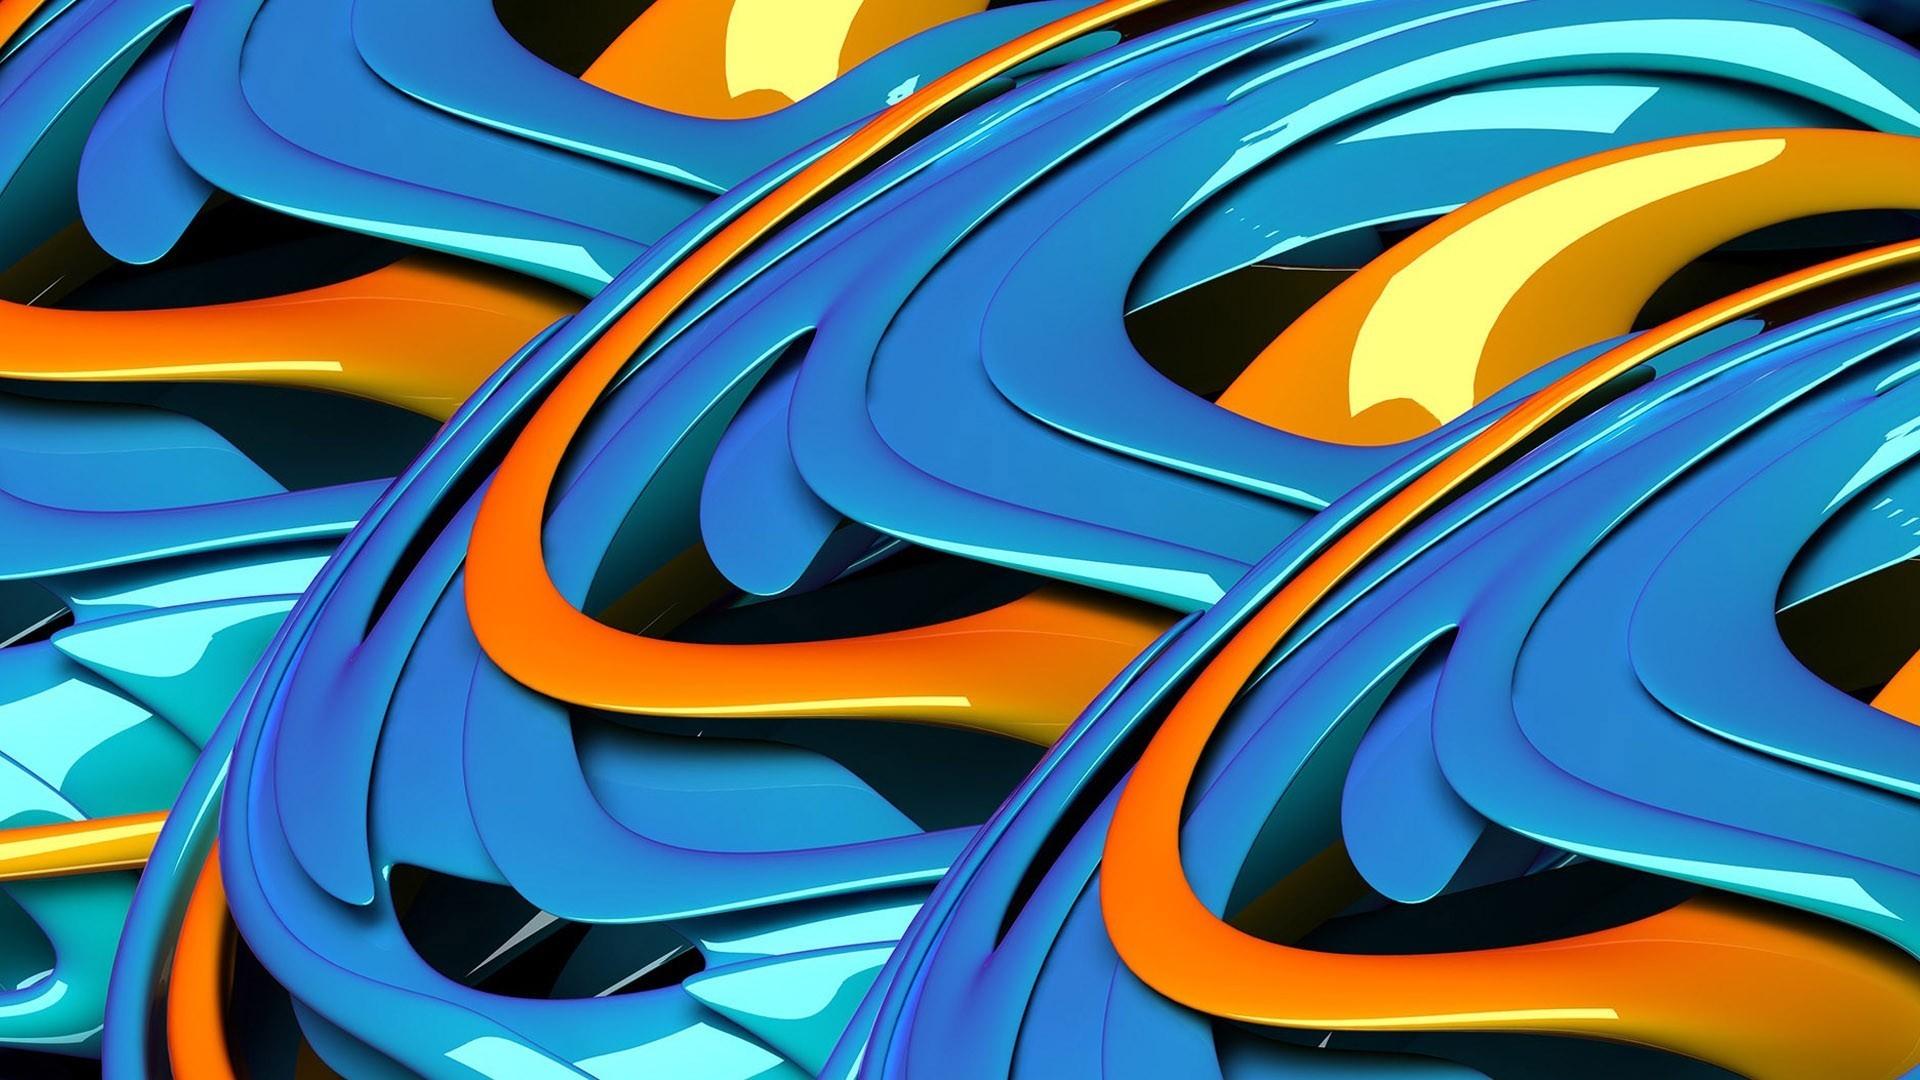 Blue Orange Background Wallpaper WallDevil   Wallpapers 4k   Pinterest    Blue orange, Orange background and Hd desktop